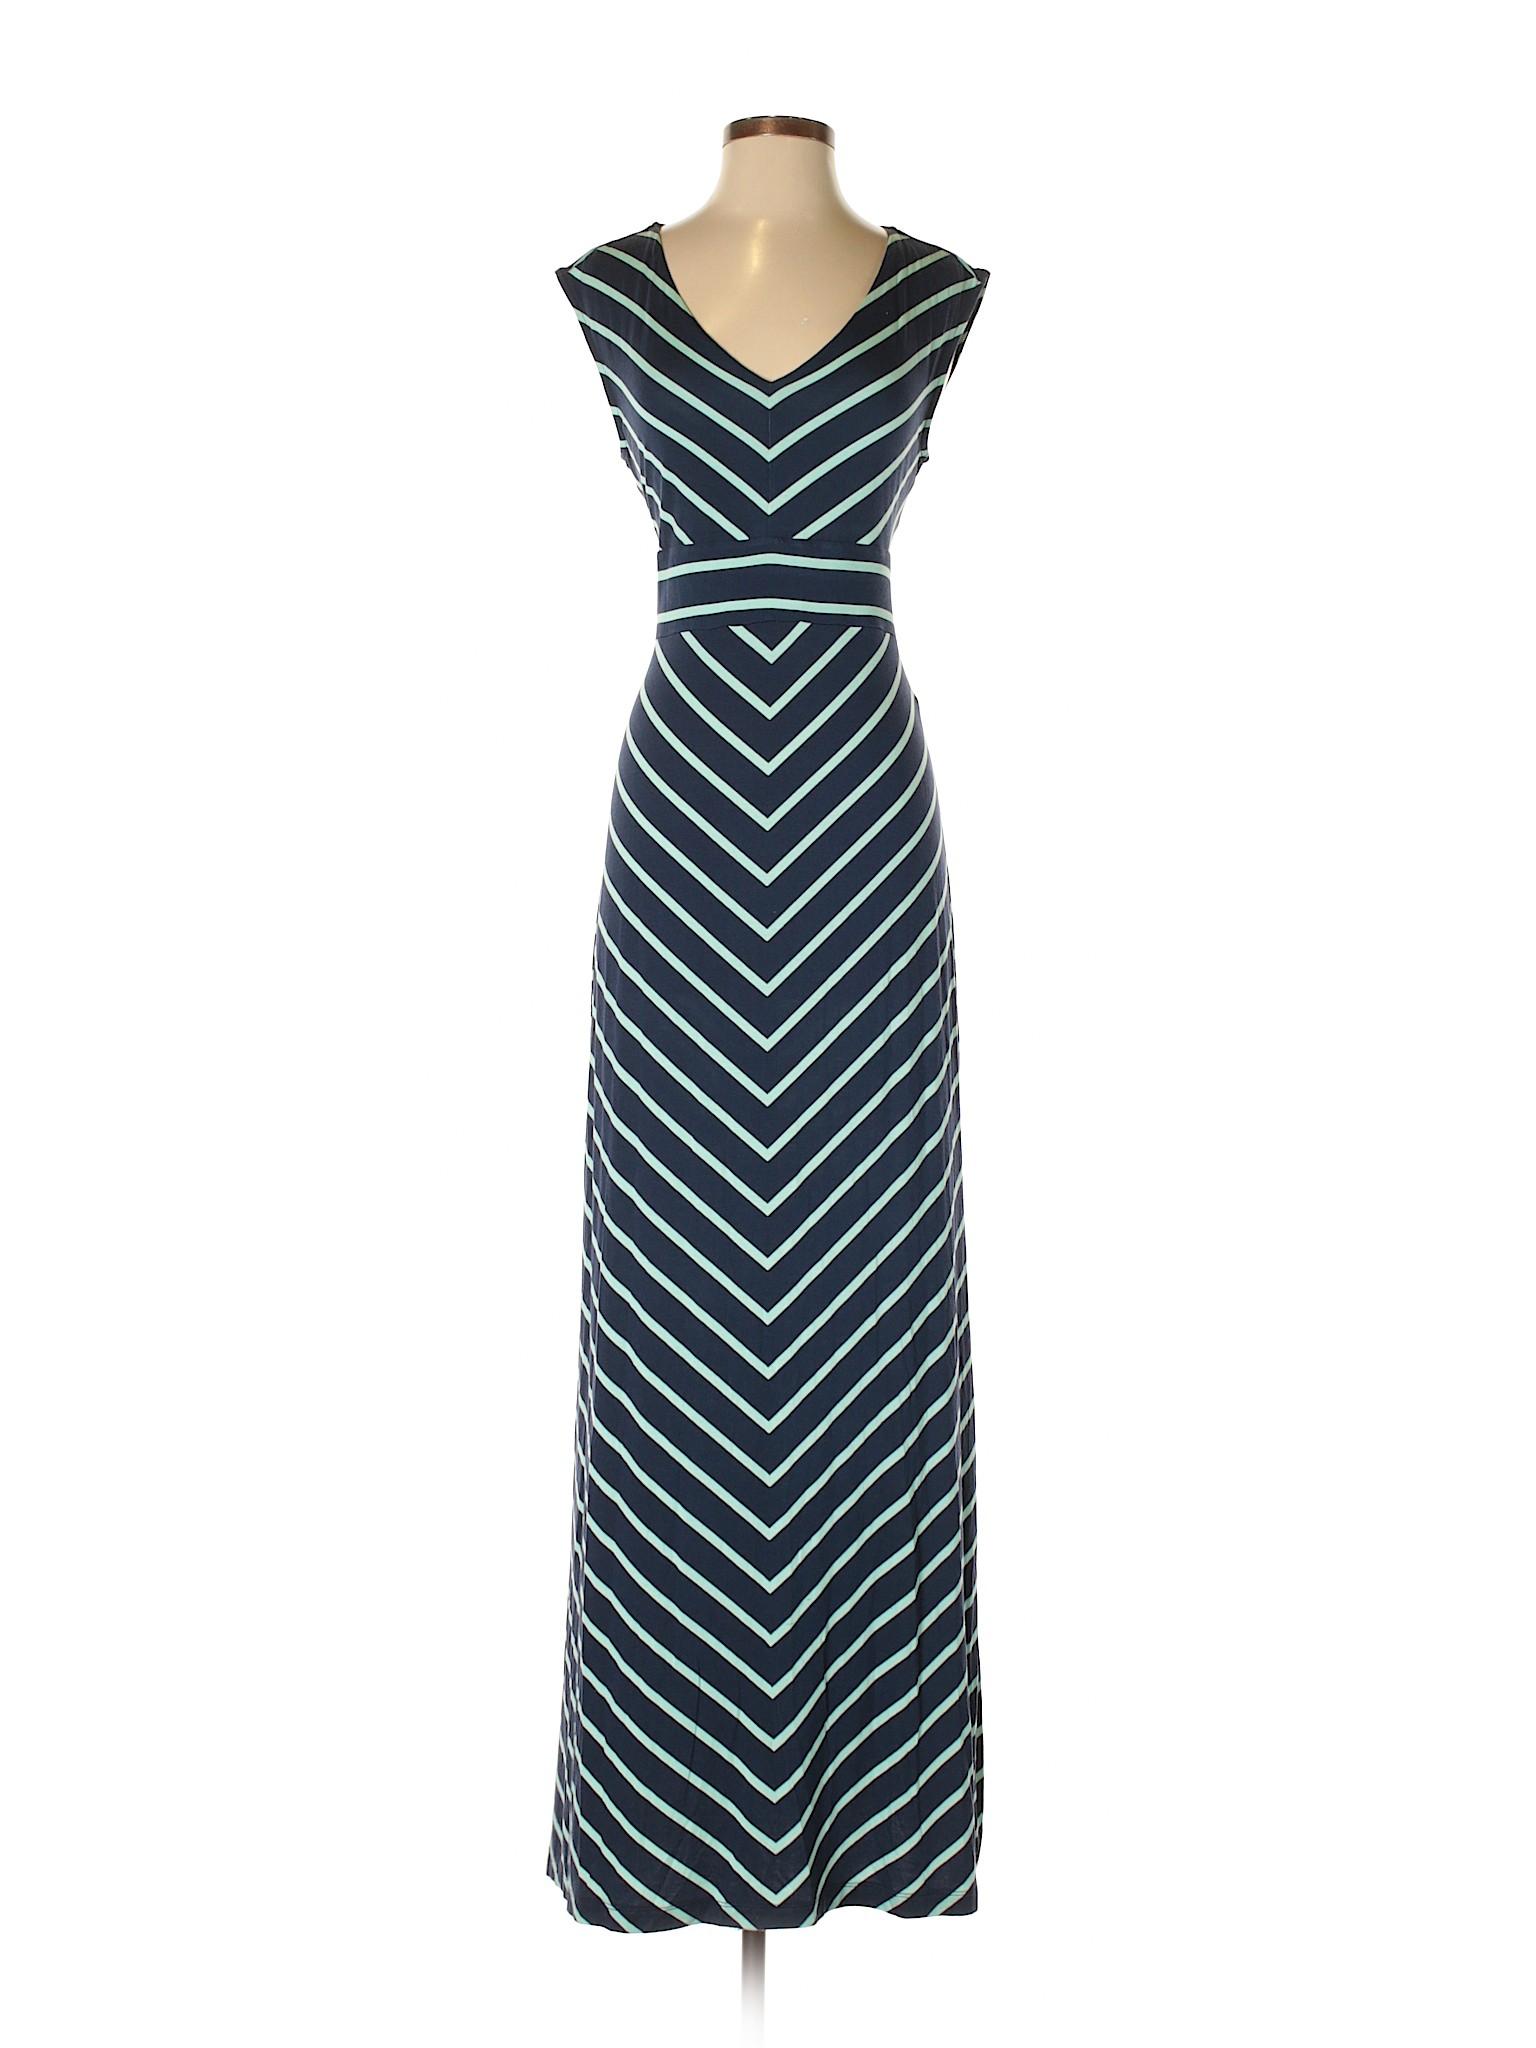 Boutique Apt Winter 9 Dress Casual Y6T6Fwqx